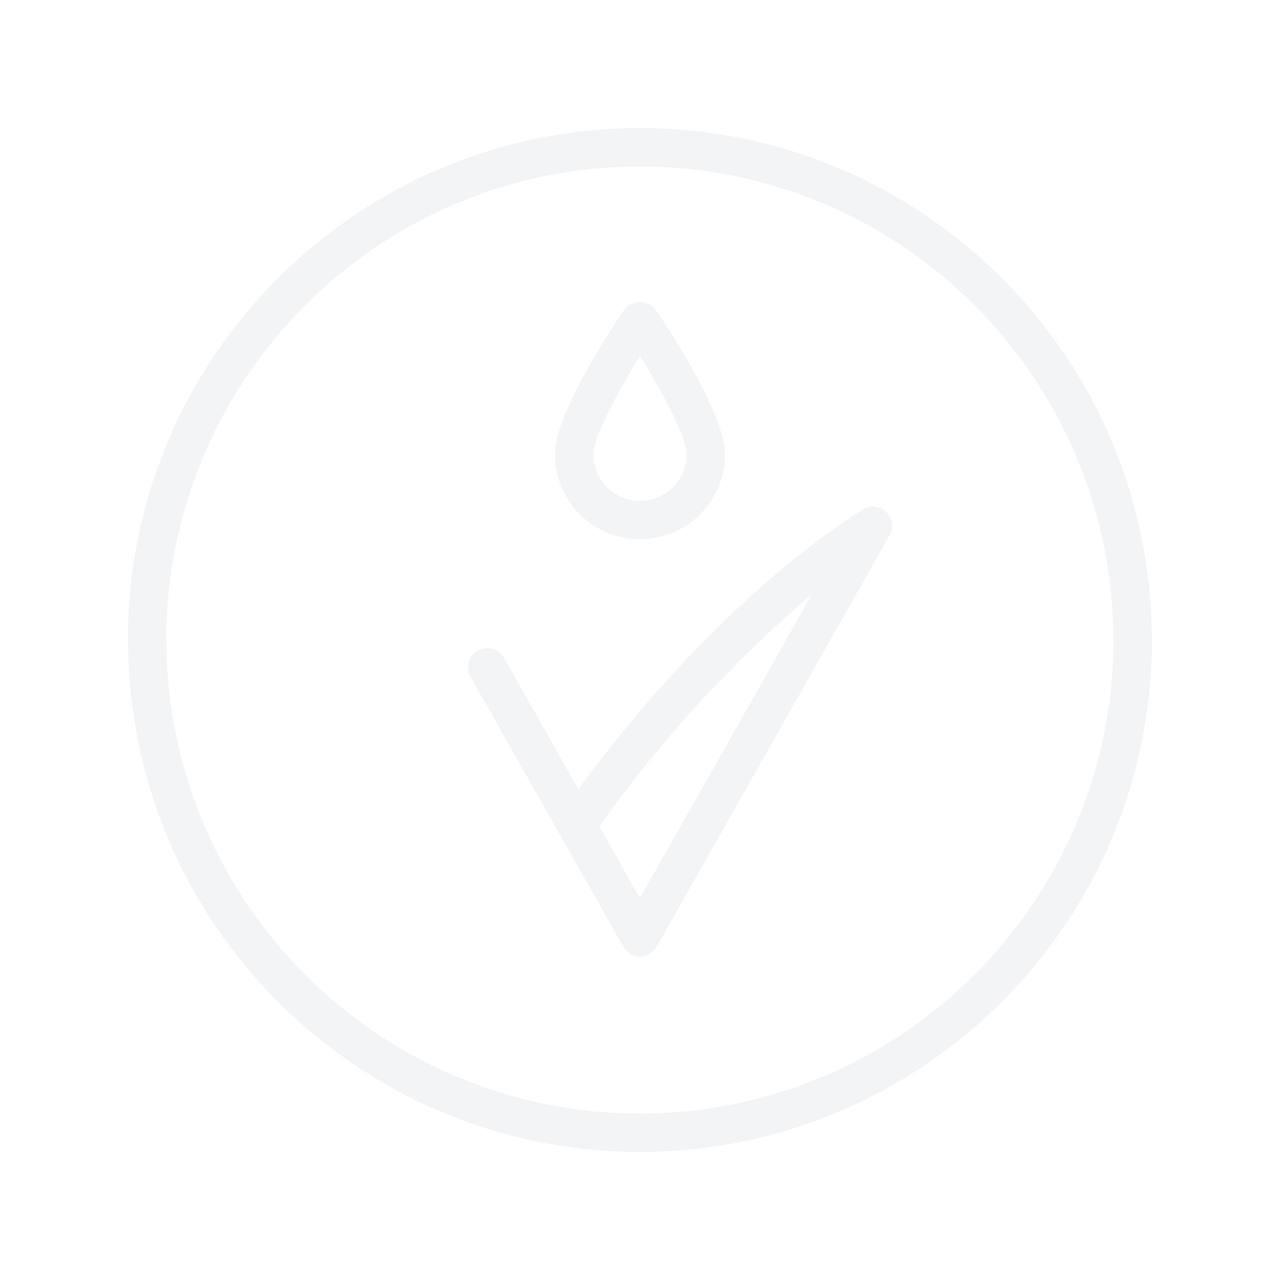 MIZON Joyful Time Essence Acerola Mask 23g